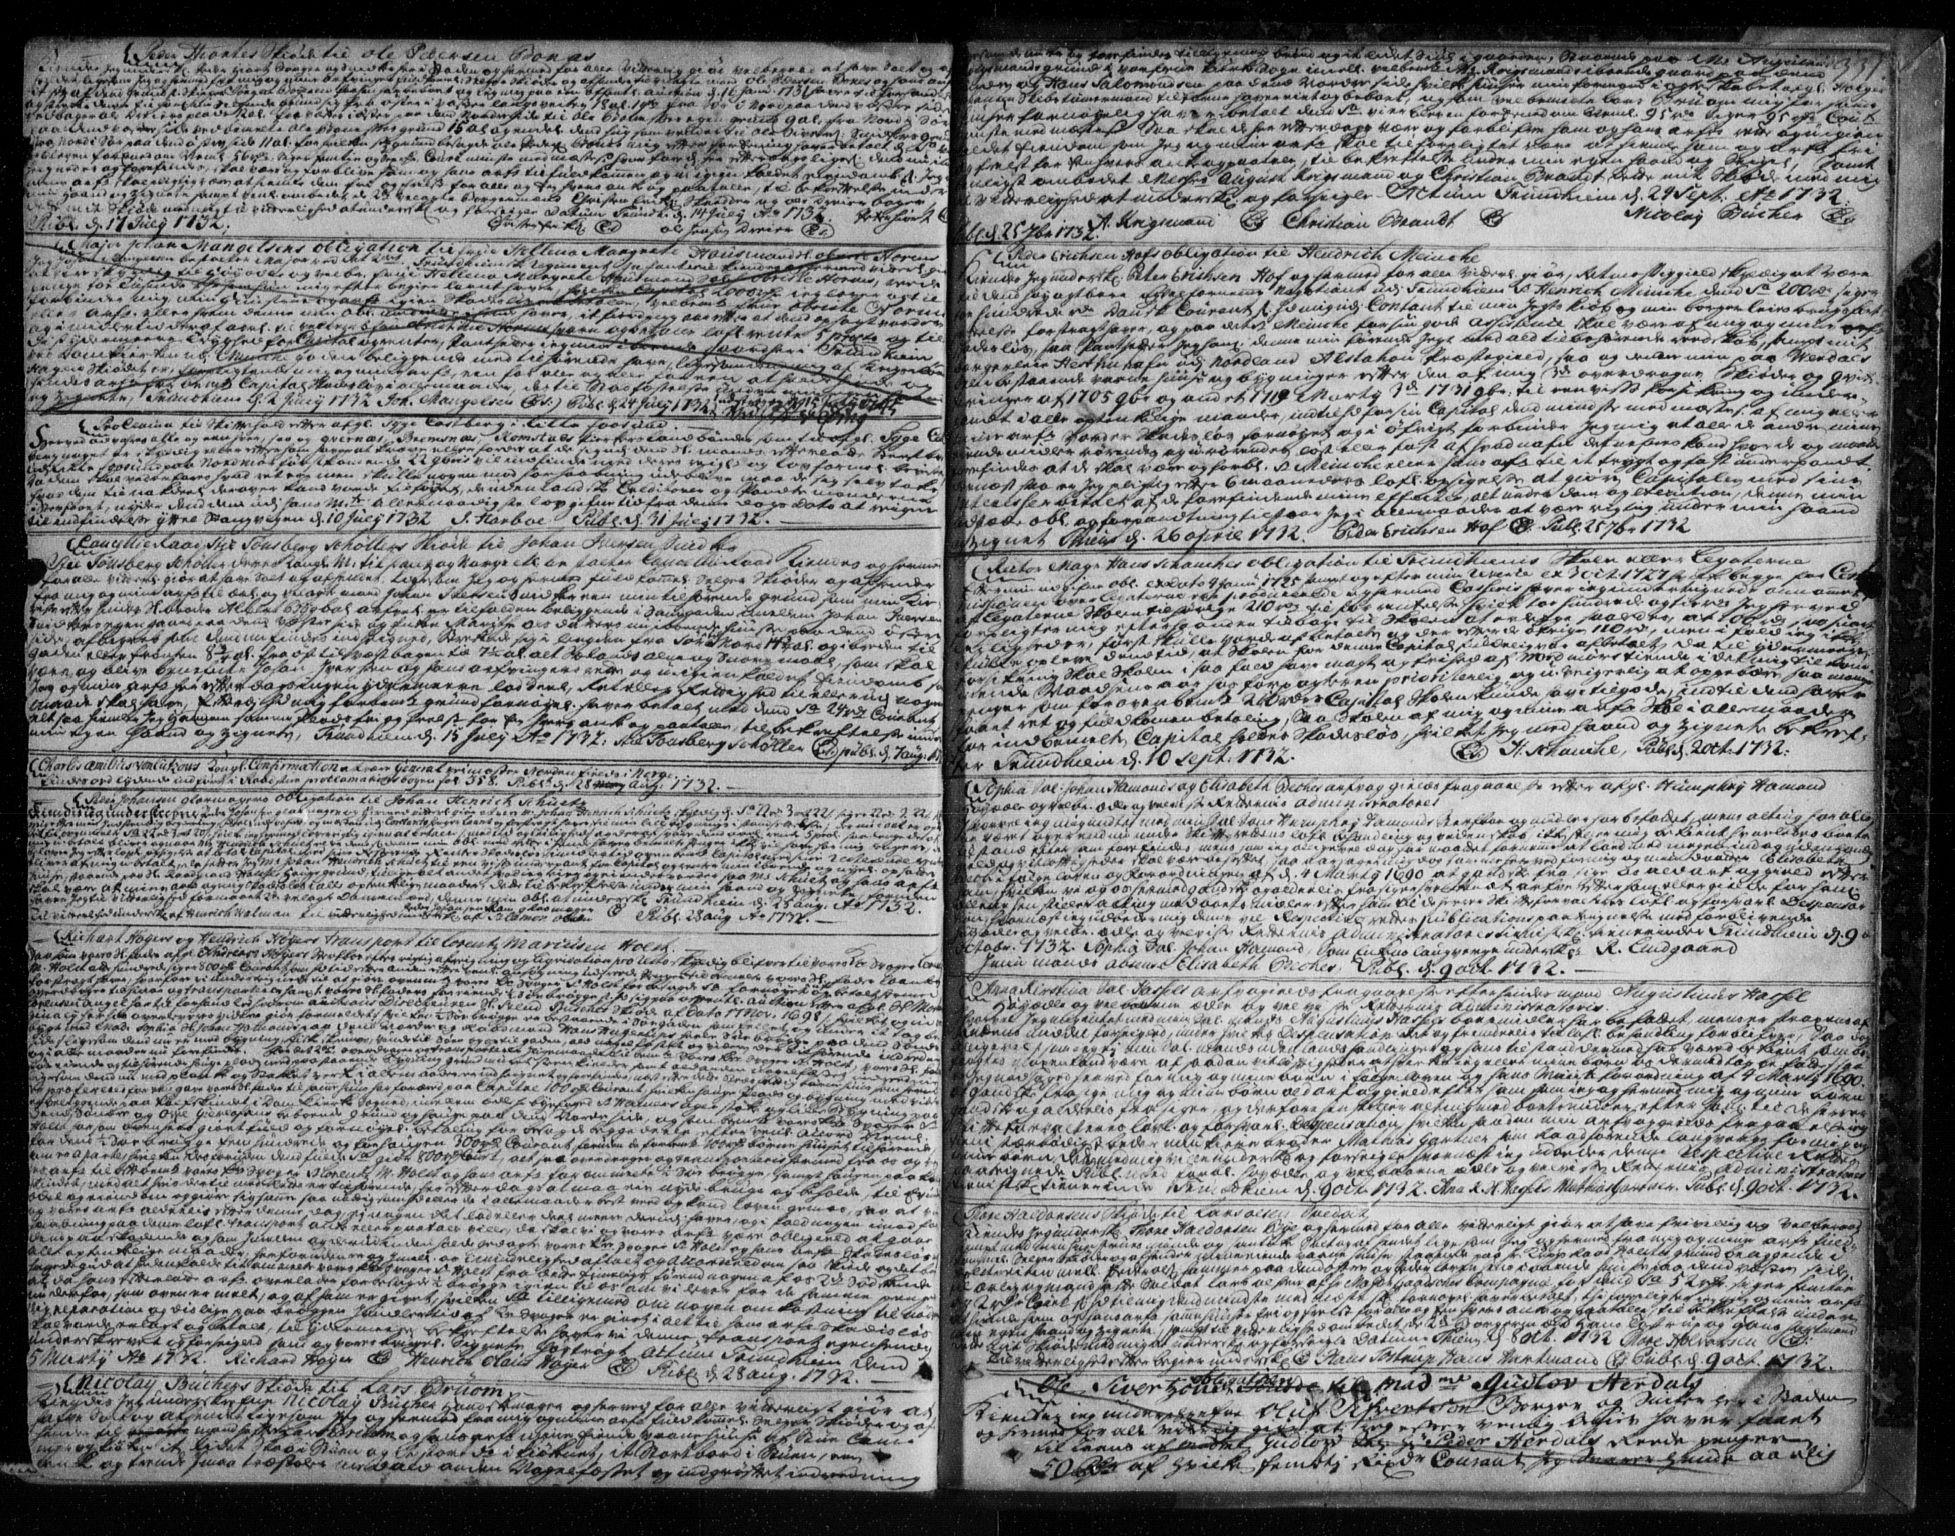 SAT, Trondheim byfogd, 2/2C/L0006: Pantebok nr. 4, 1720-1733, s. 331